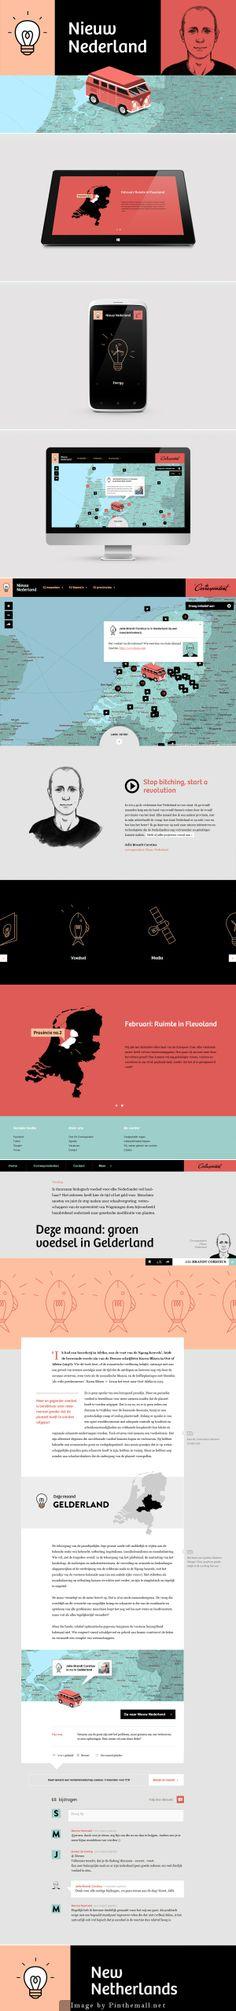 New Netherlands #webdesign #flat #design #UI